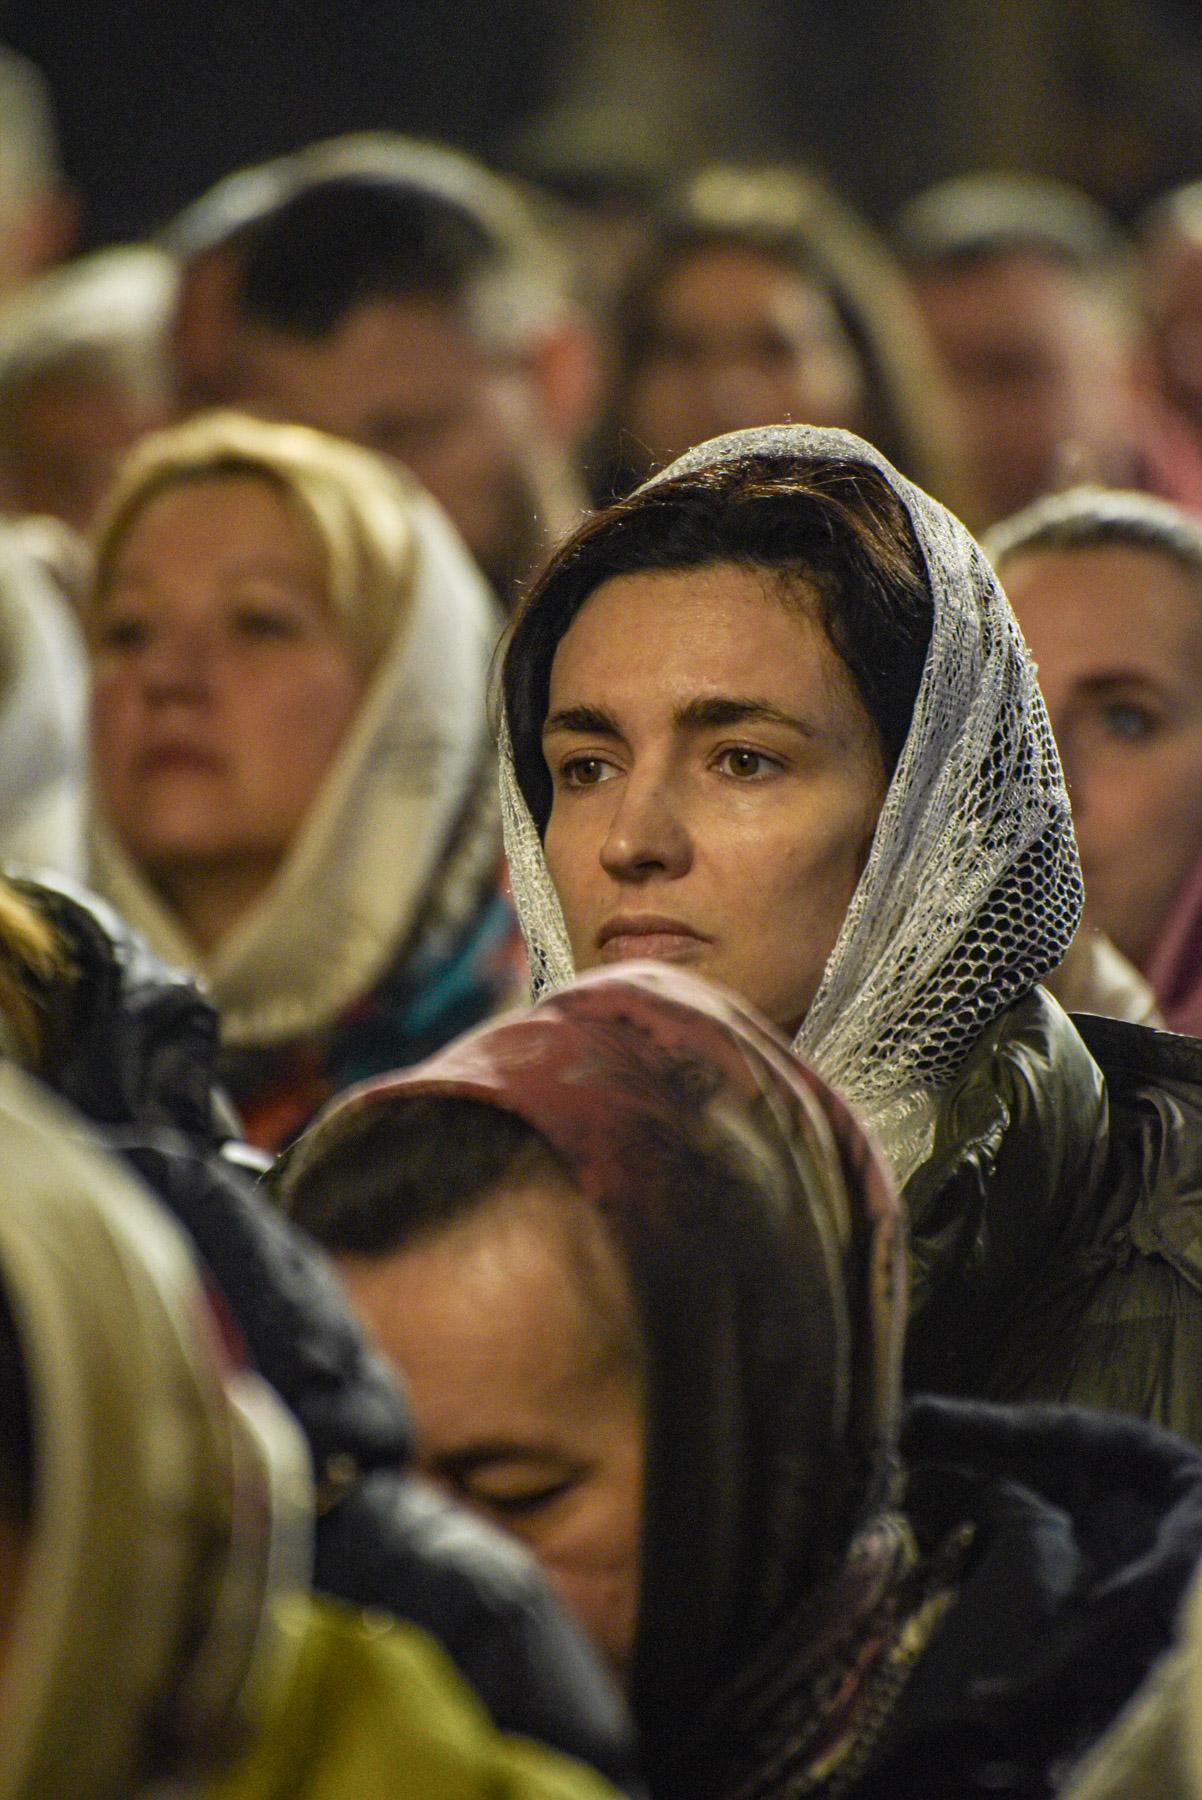 photos of orthodox christmas 0220 2